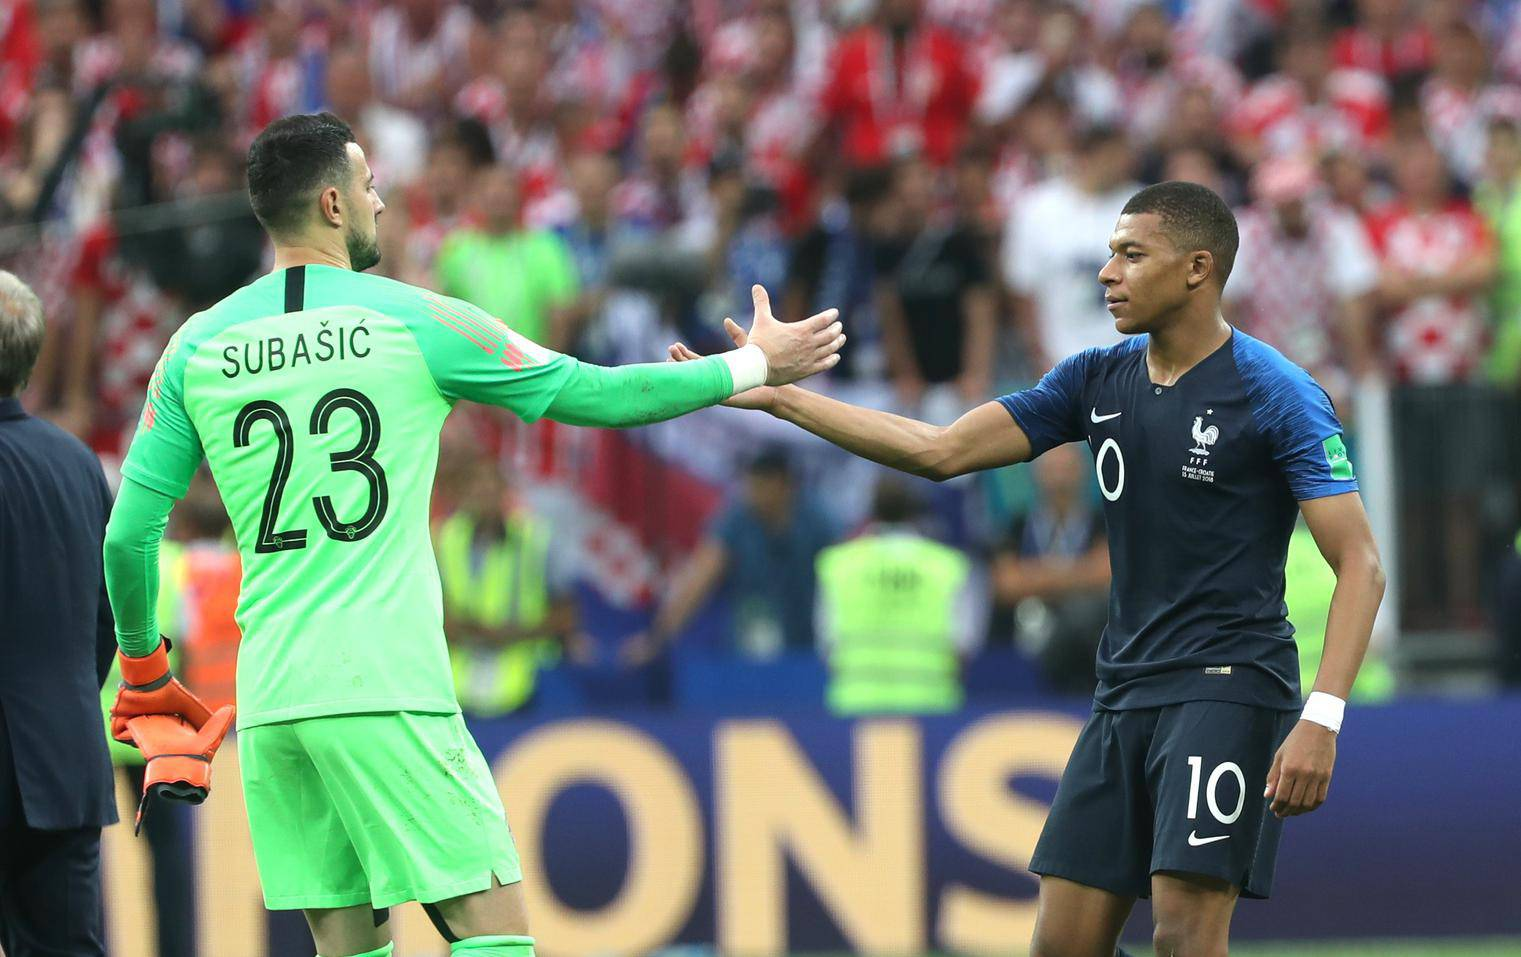 FIFA World Cup 2018: France vs. Croatia